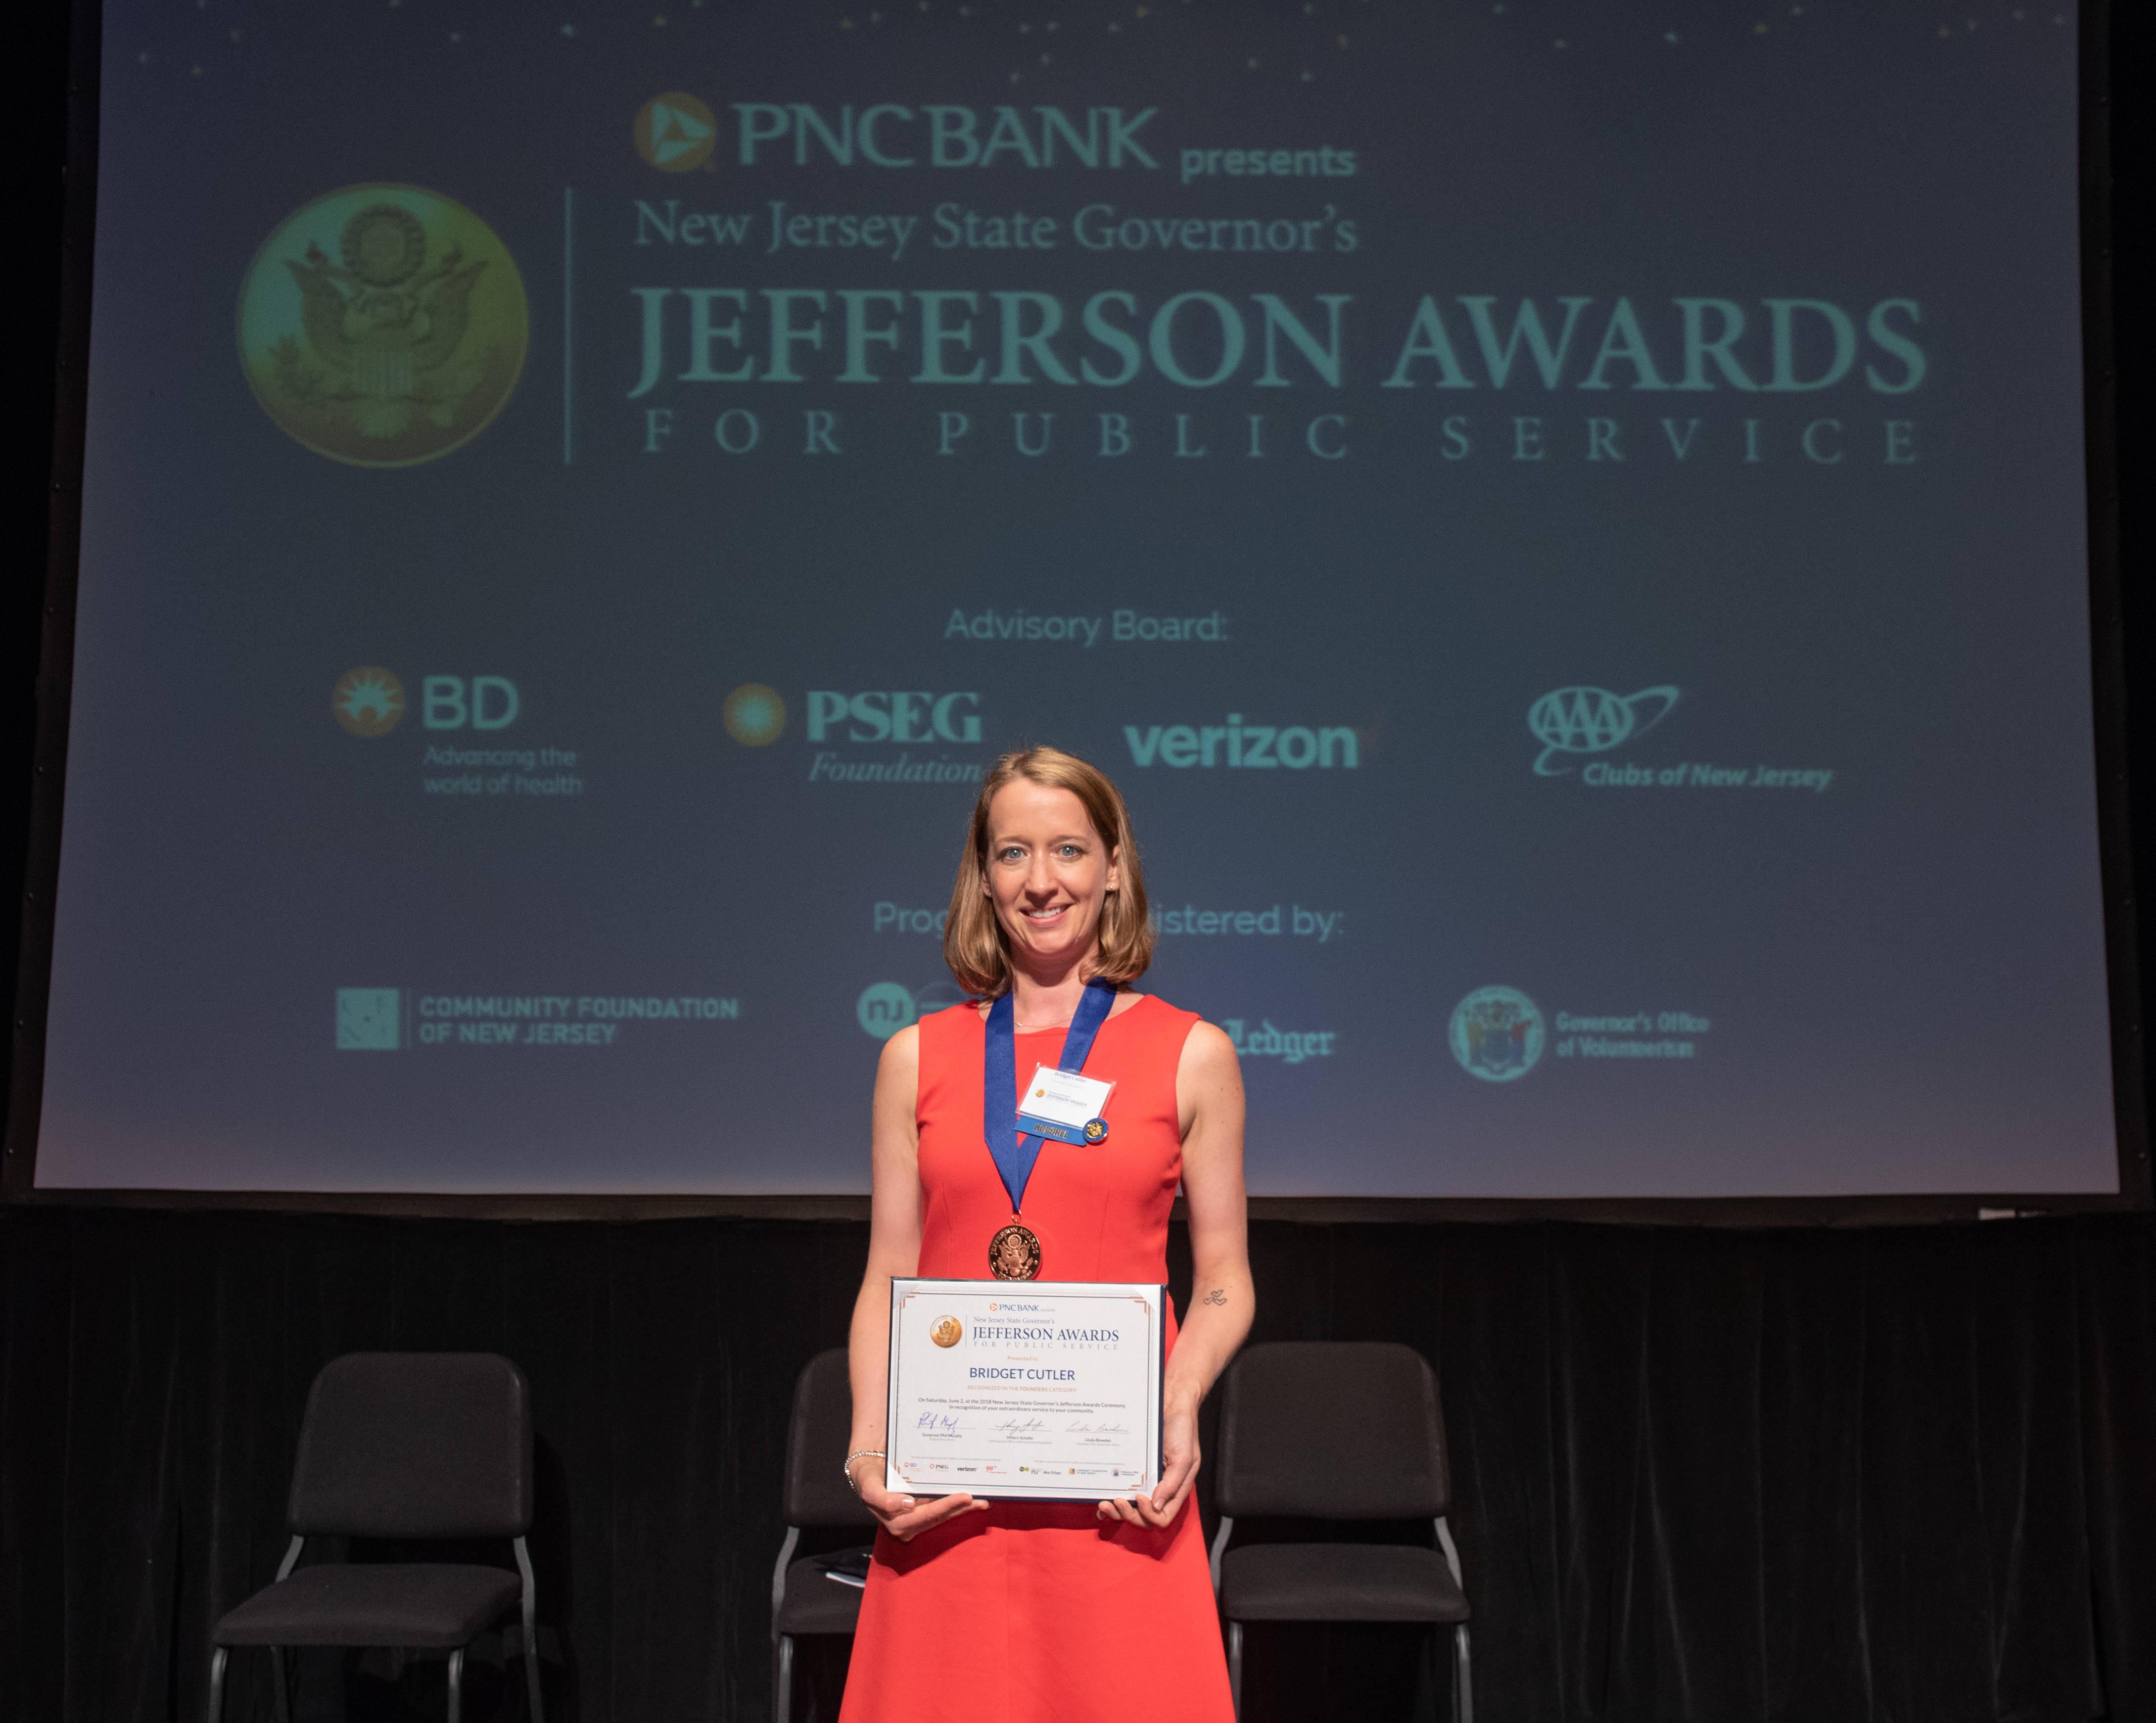 556526a905aeec3dcc21_Jefferson_Awards.jpg